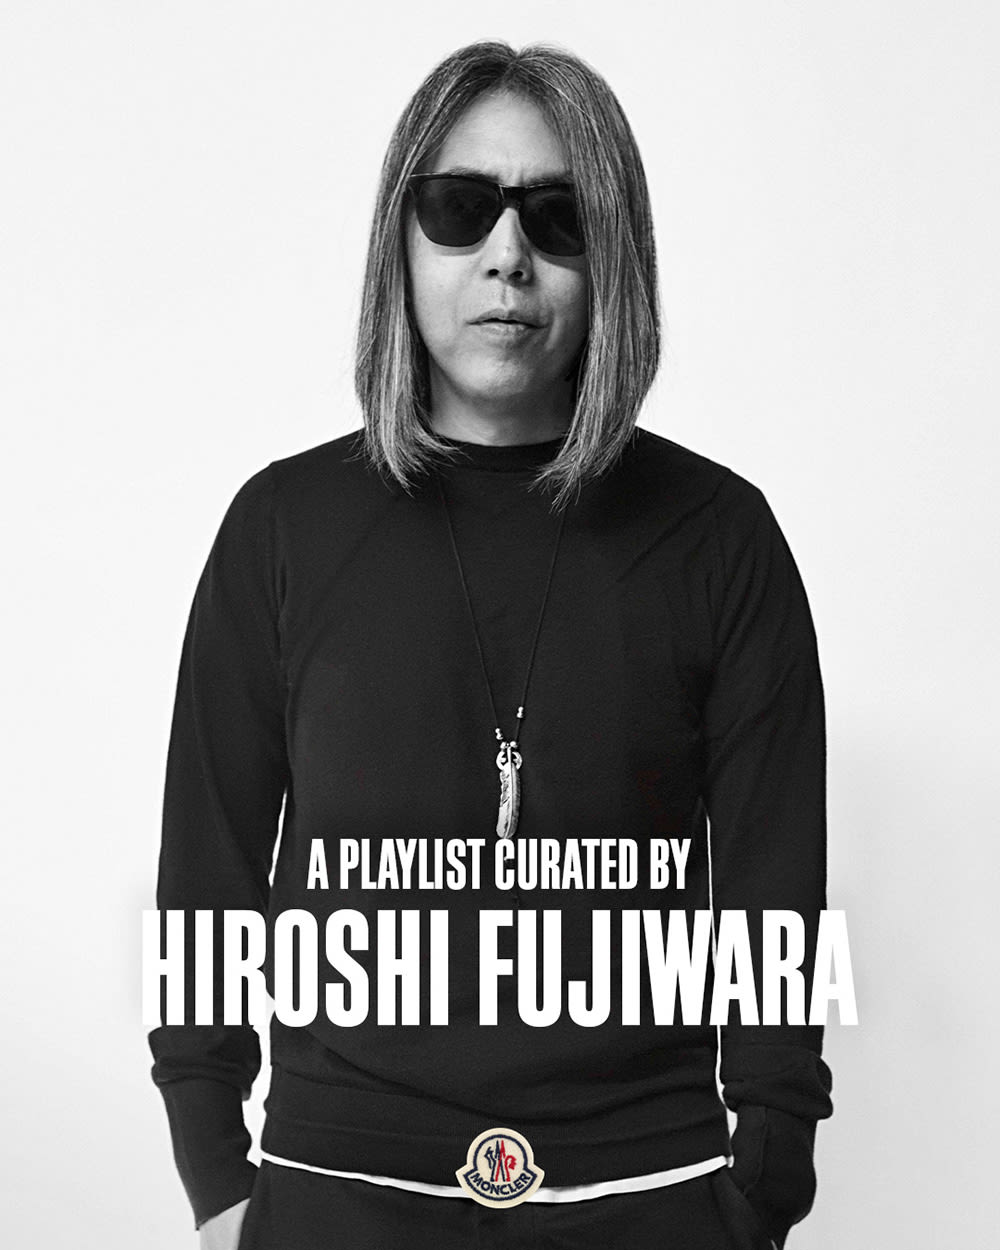 Warmly Moncler: A Spotify Playlist Curated by Hiroshi Fujiwara